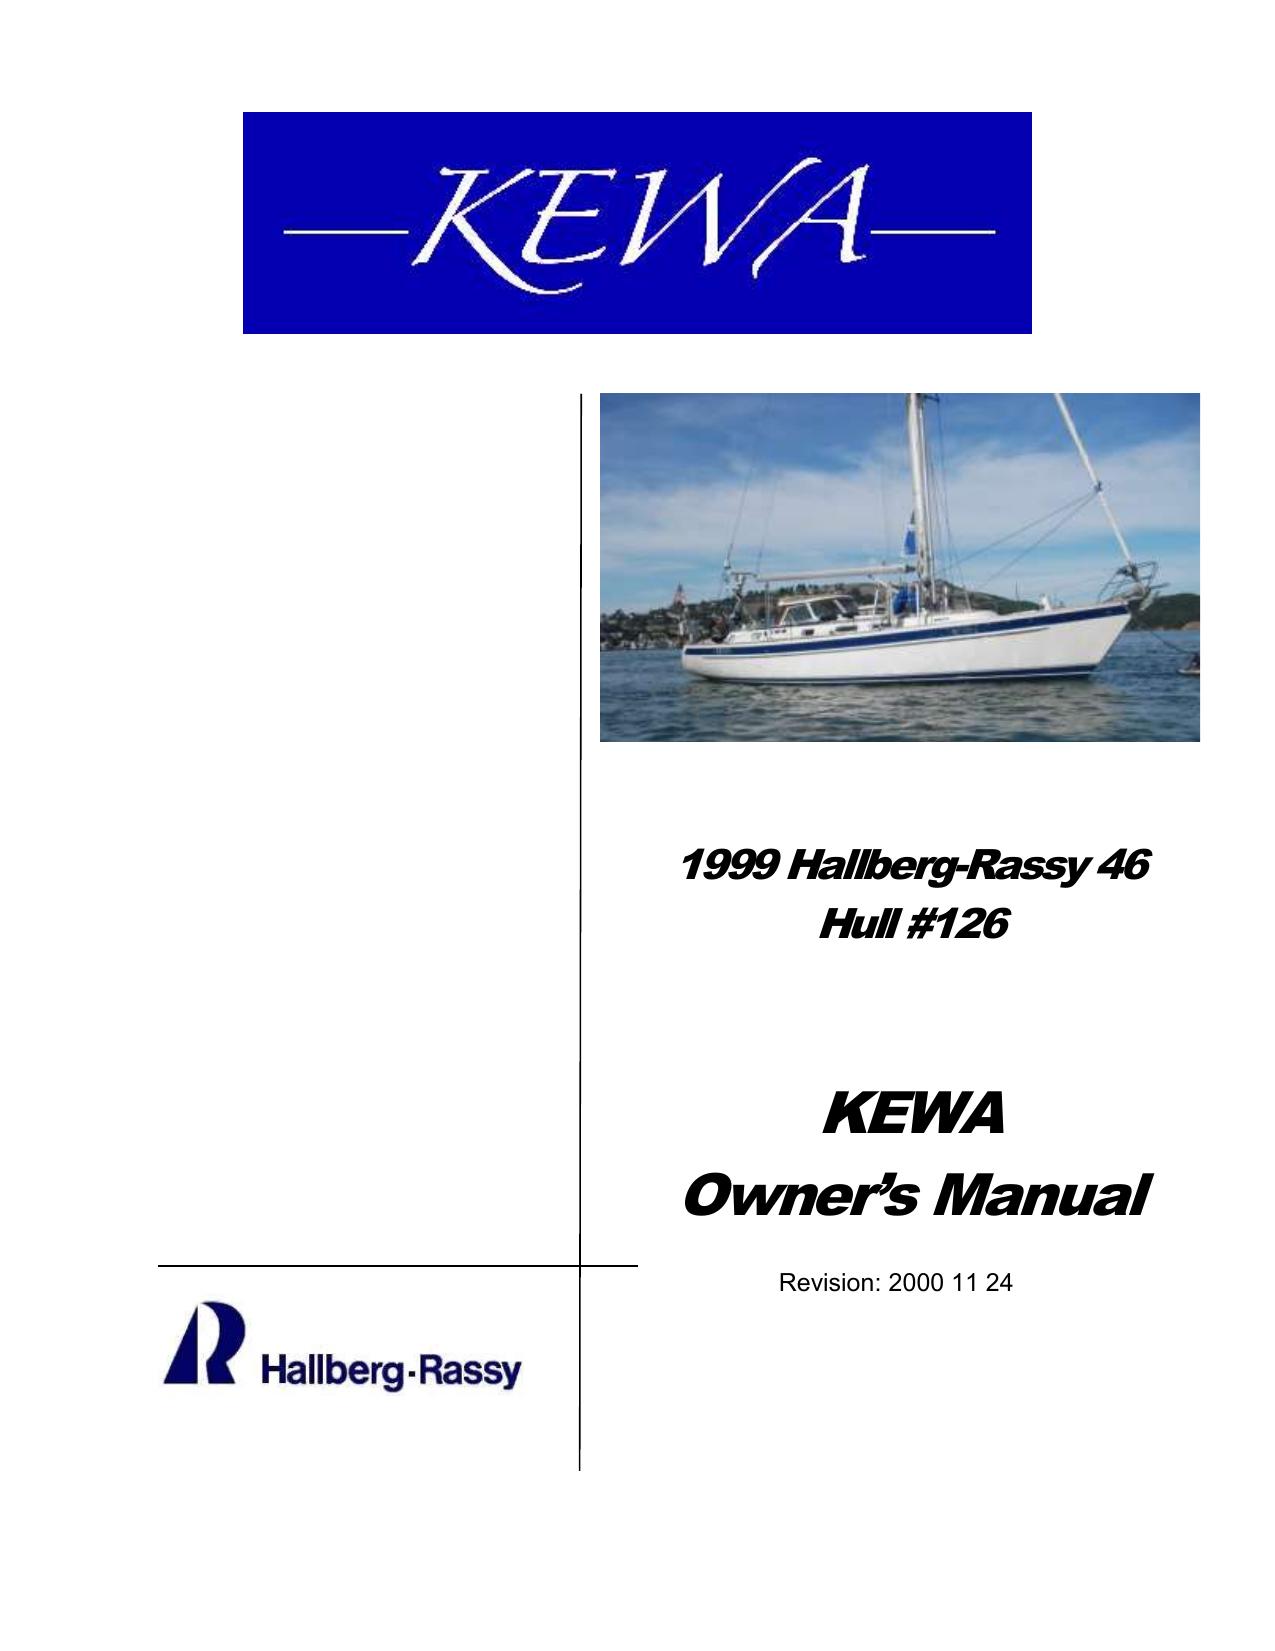 kewa s owner s manual rh studylib net